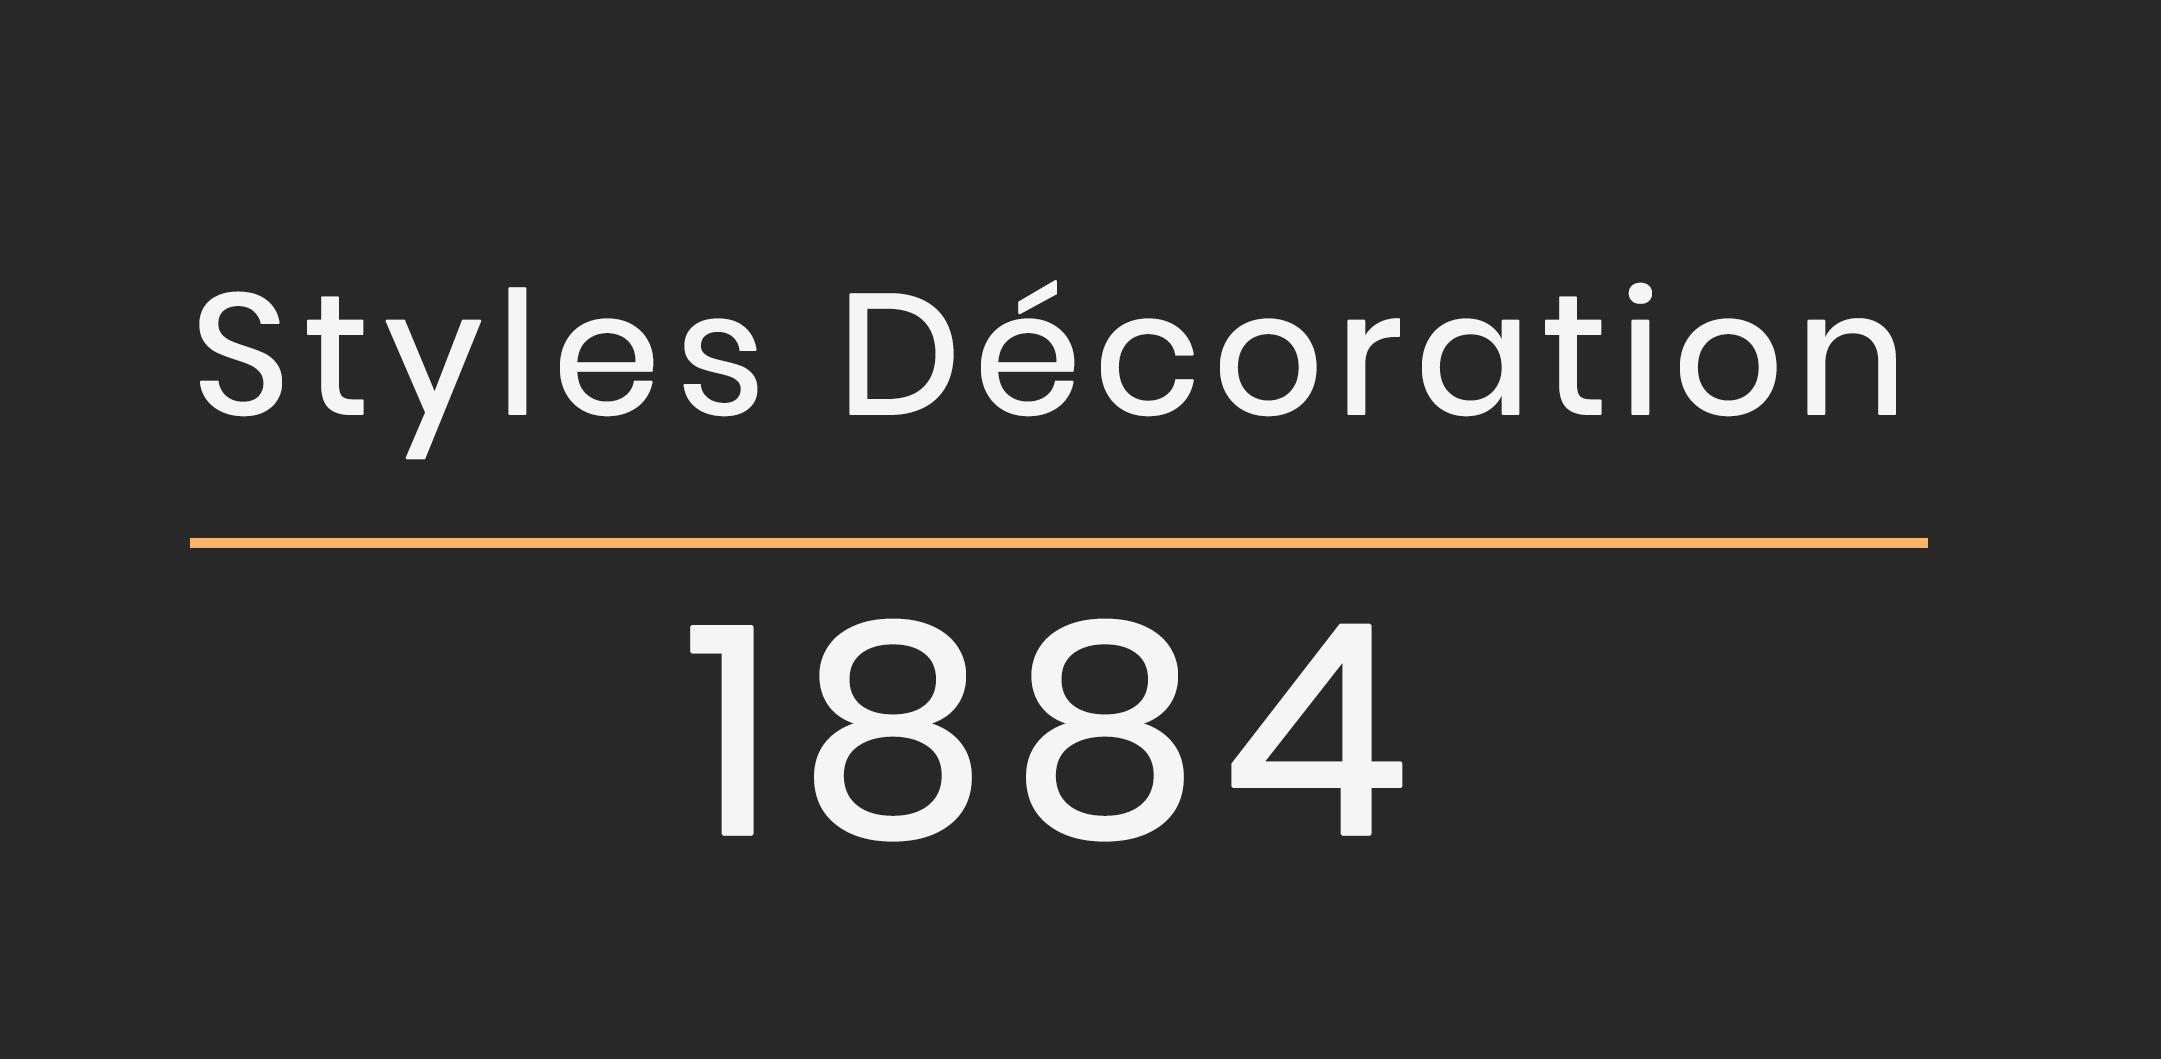 Styles Décoration 1884